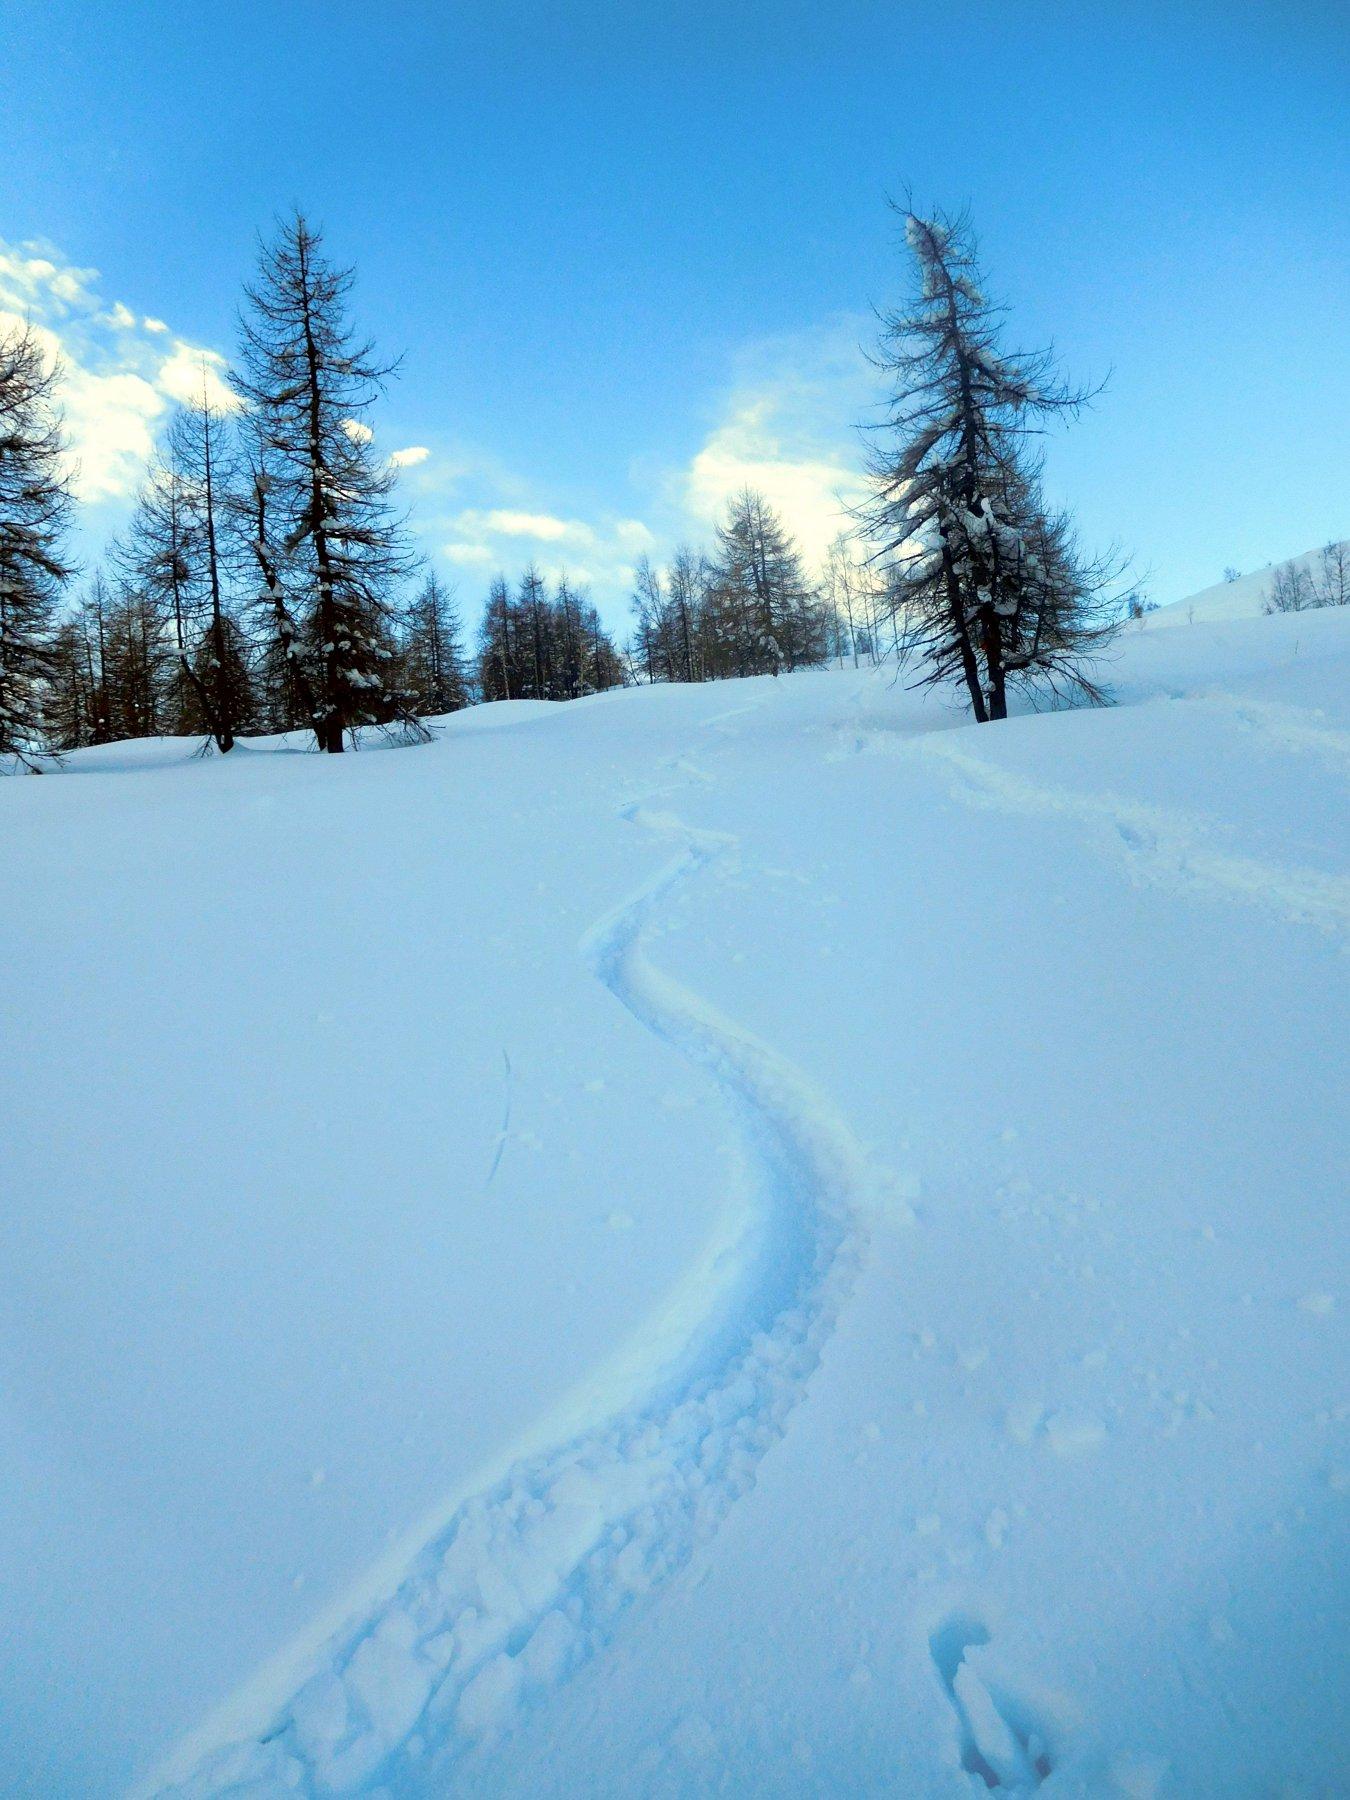 bella neve qui